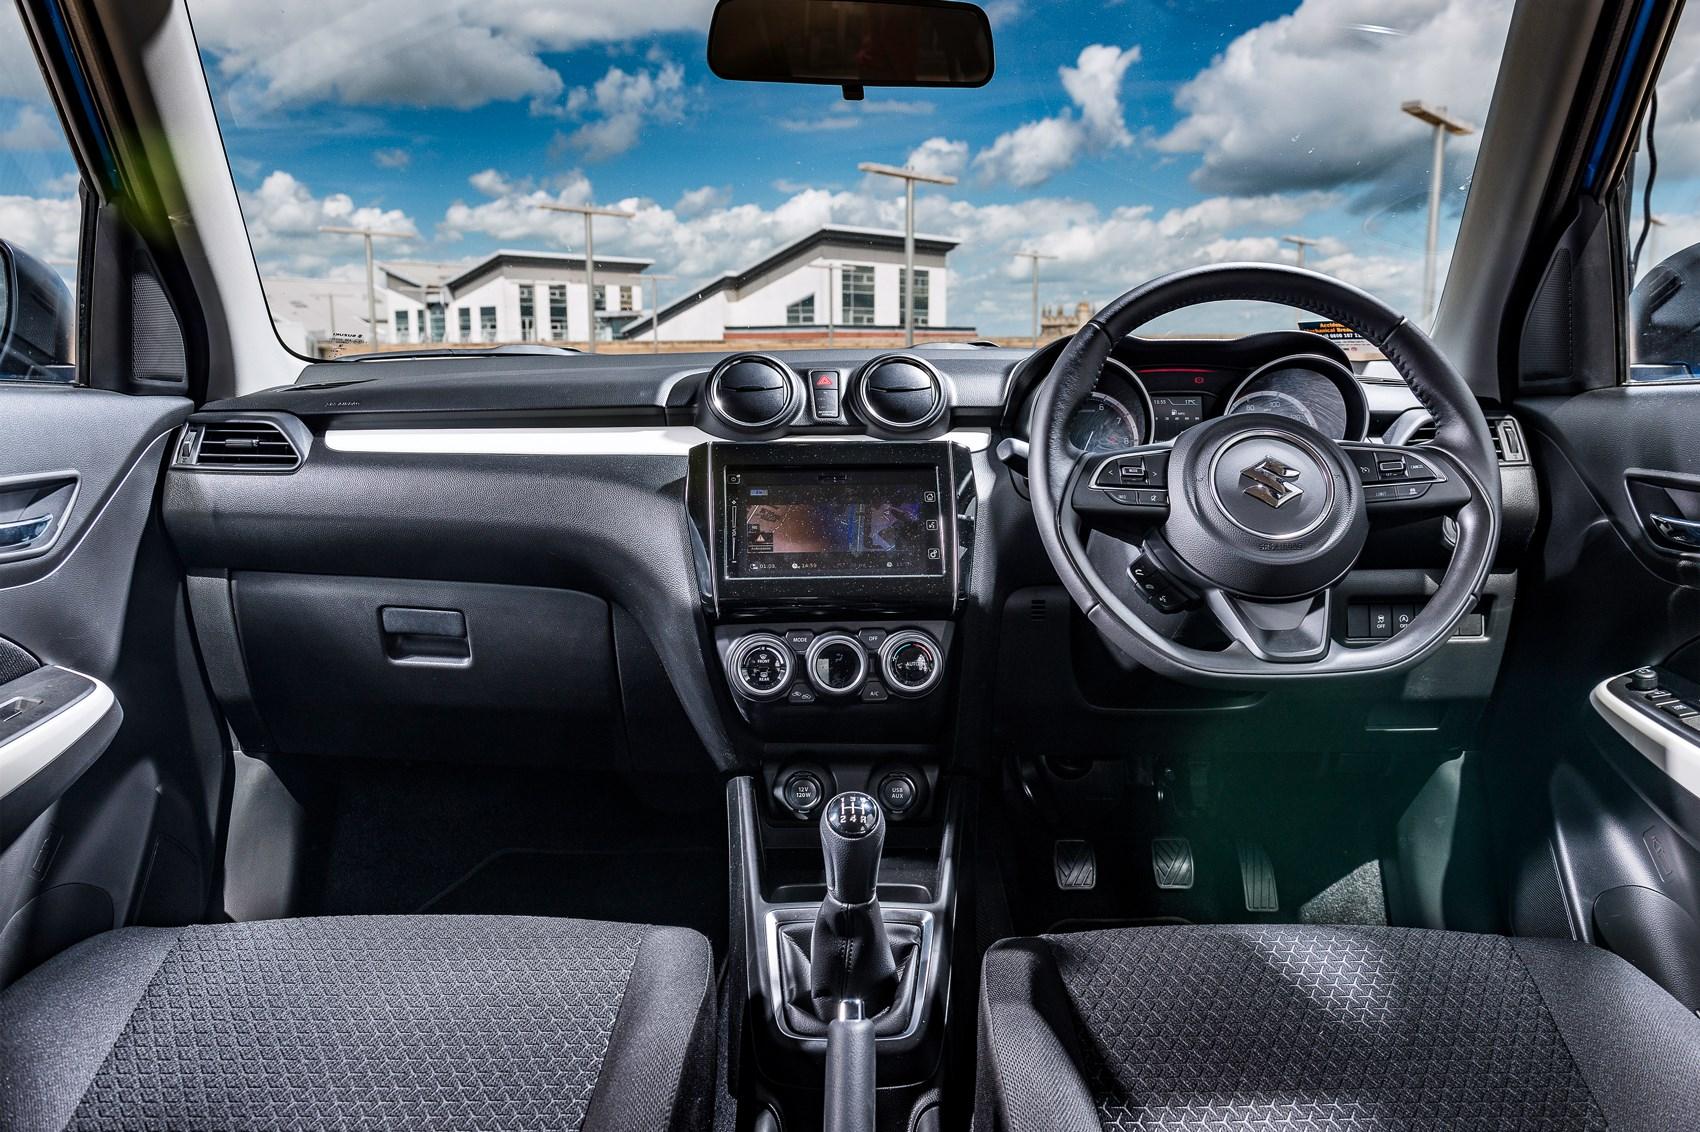 suzuki swift vs nissan micra vs citroen c3 triple test review car magazine. Black Bedroom Furniture Sets. Home Design Ideas